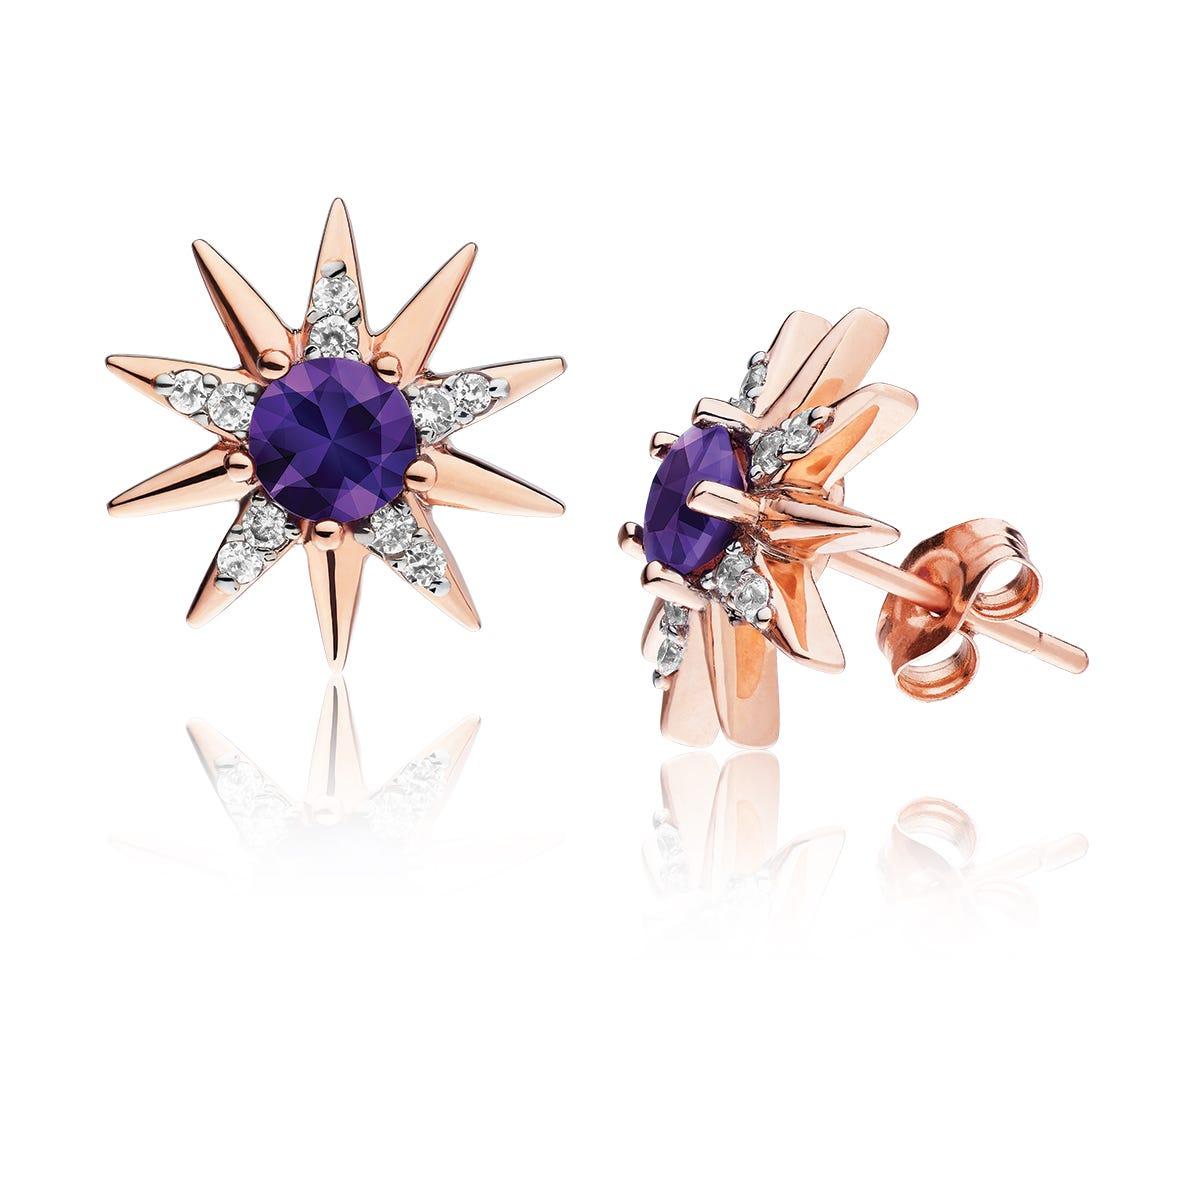 Amethyst & Diamond Star Stud Earrings in 10k Rose Gold